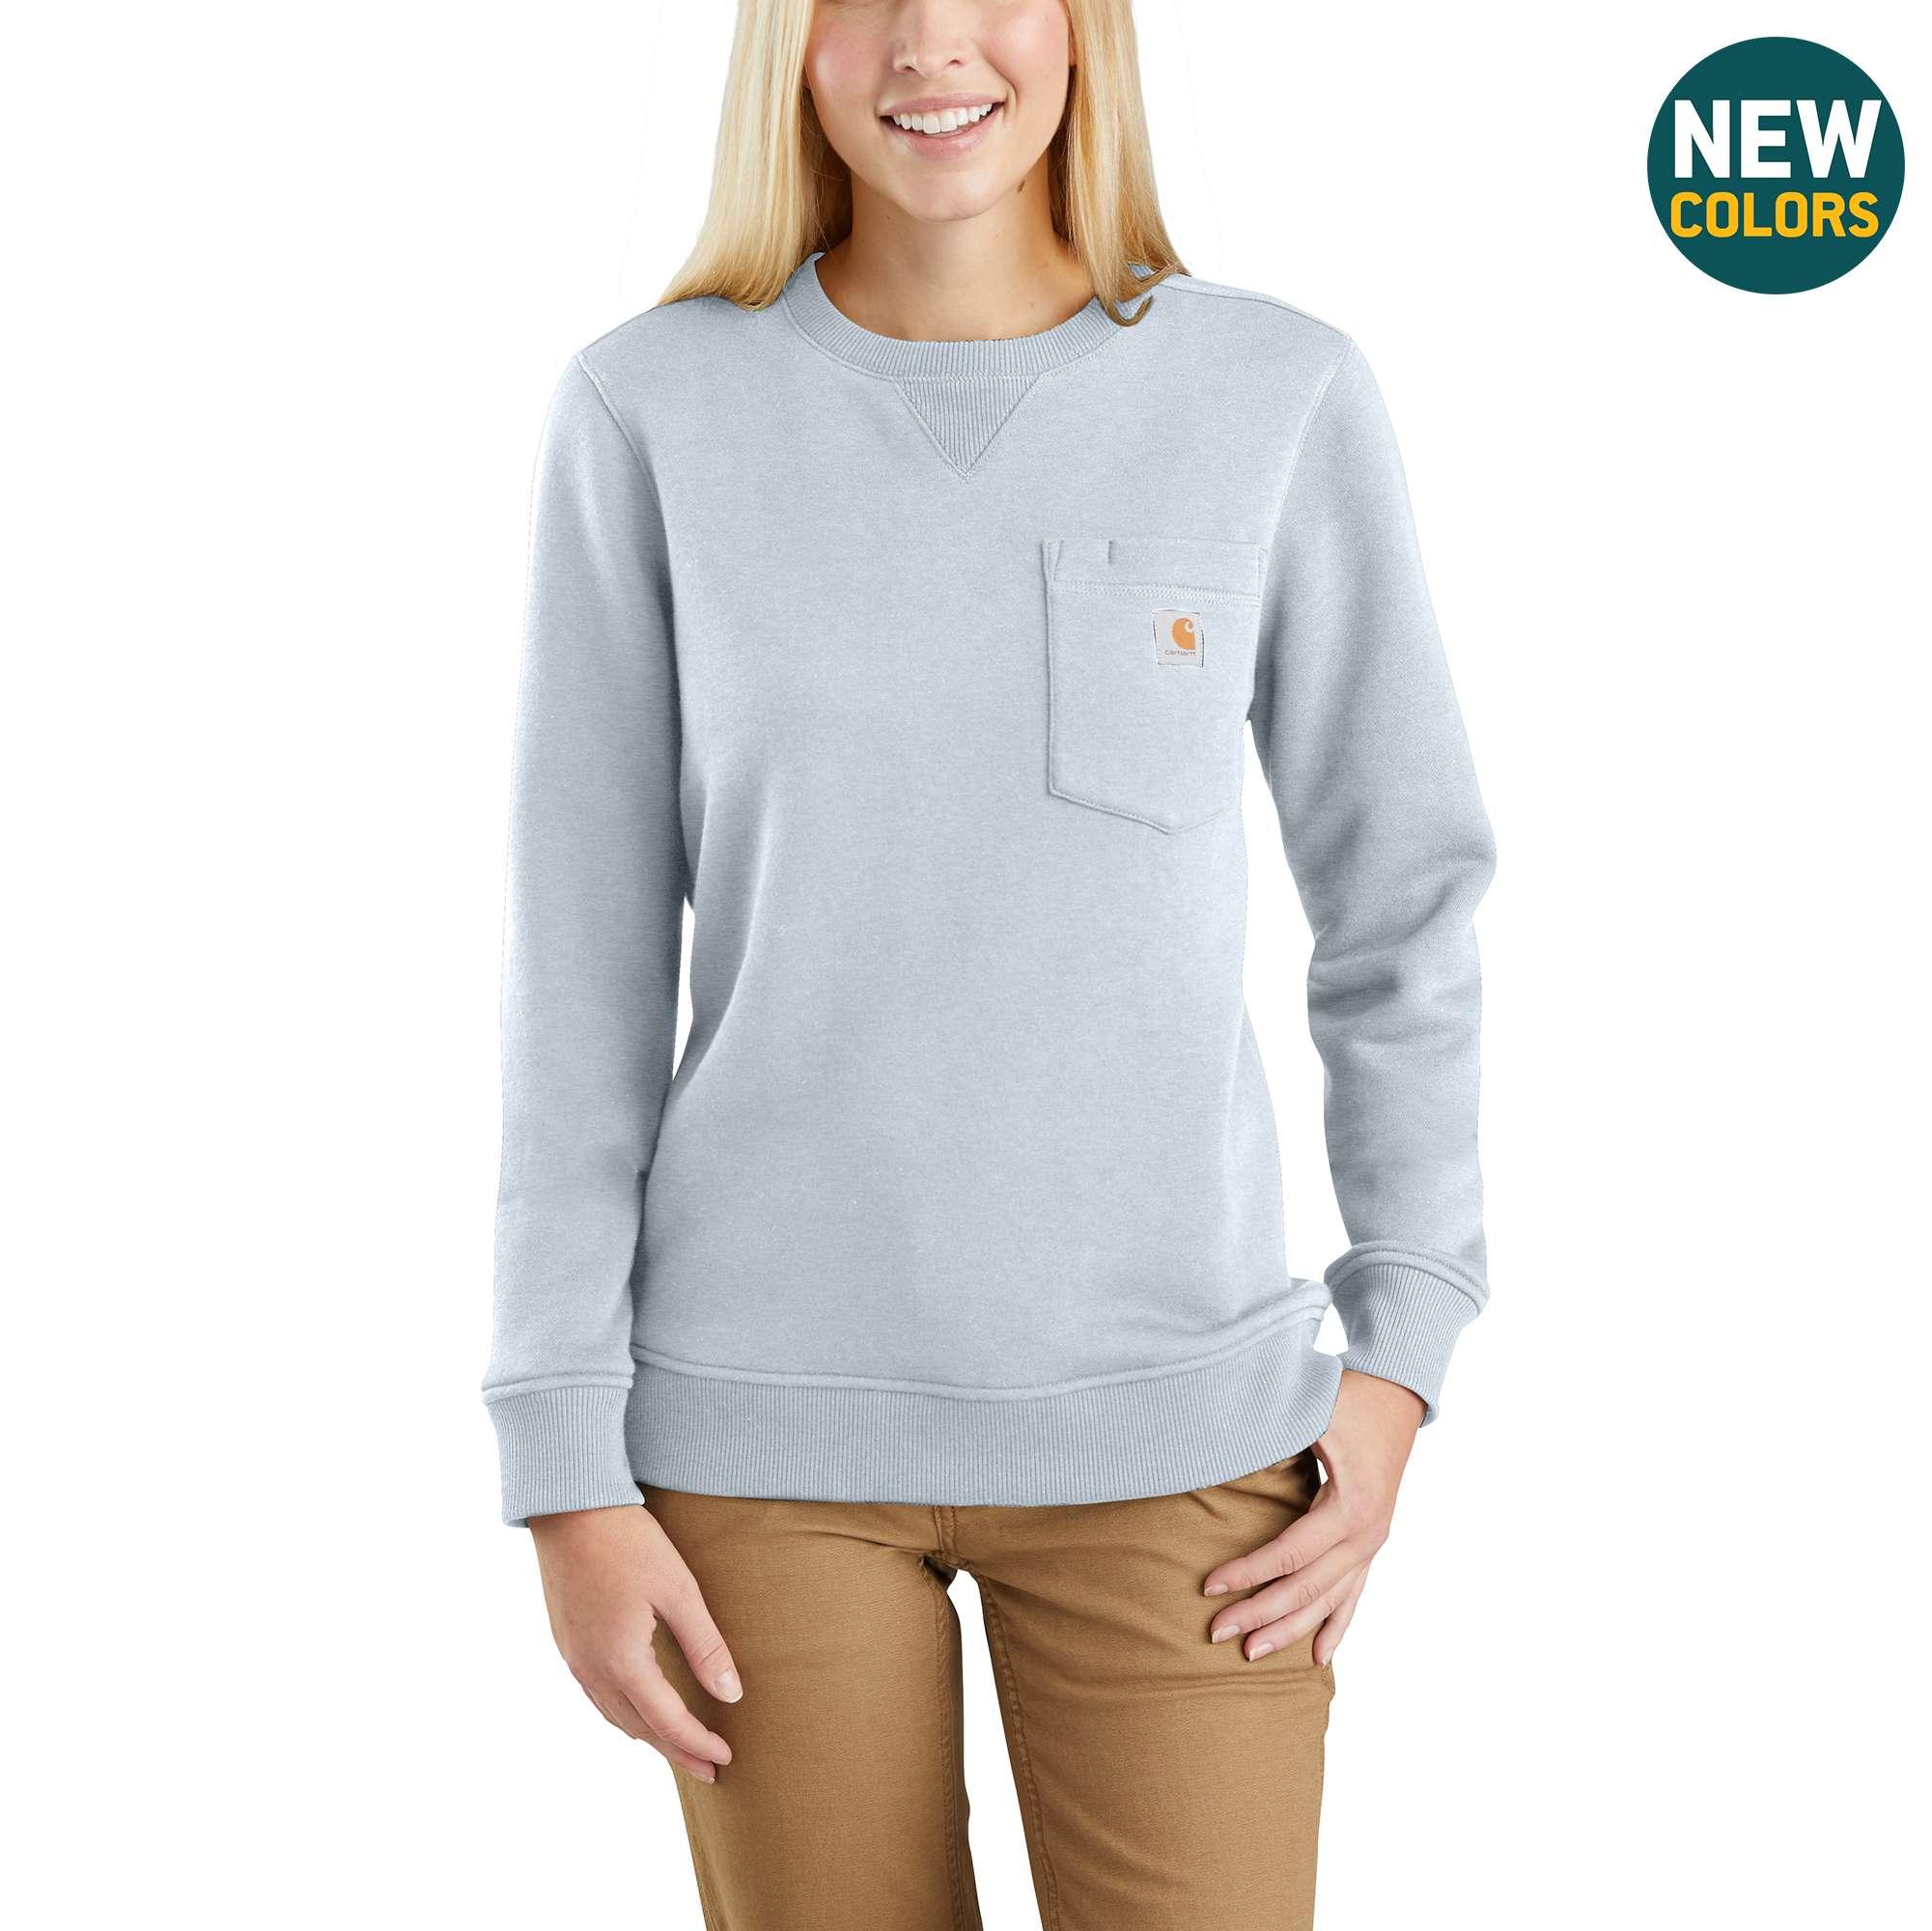 Carhartt Clarksburg Crewneck Pocket Sweatshirt